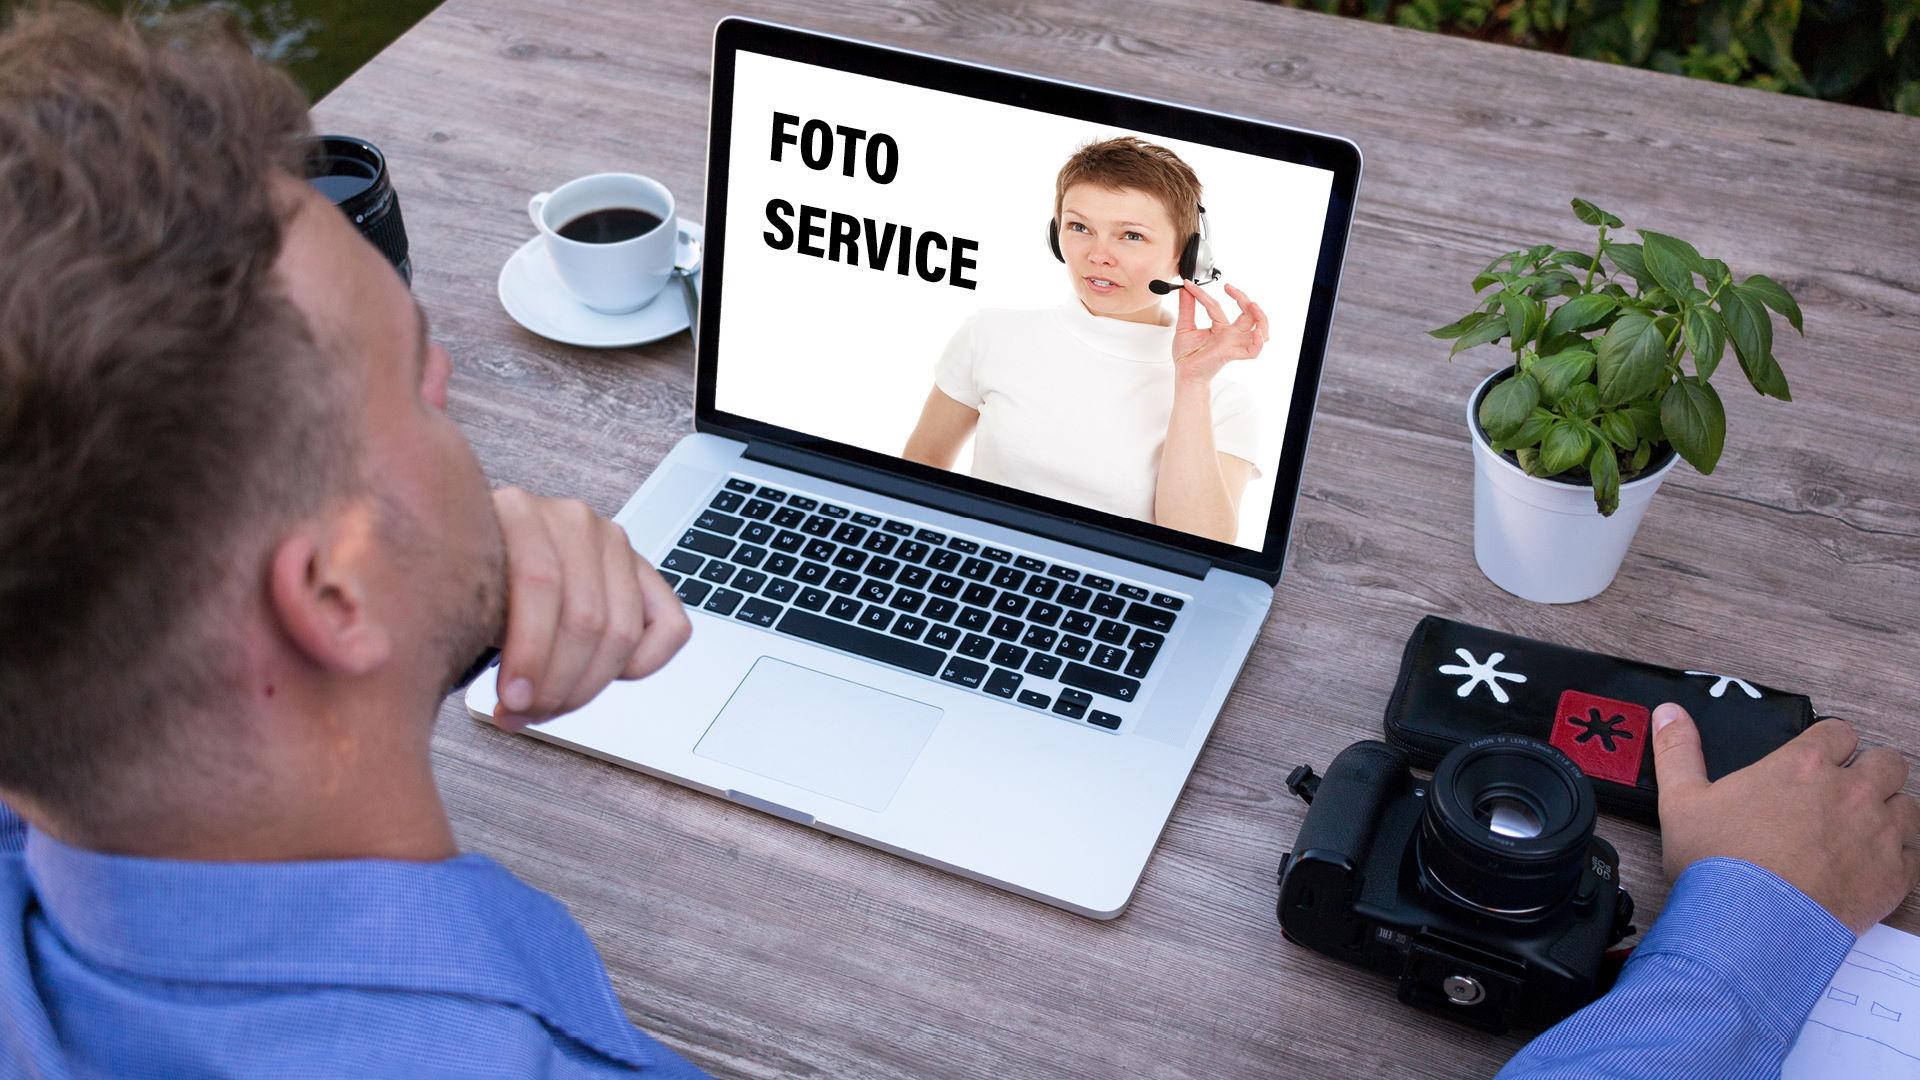 Fotoservice_Advertising Solution_Werbeagentur Bezirk Mödling